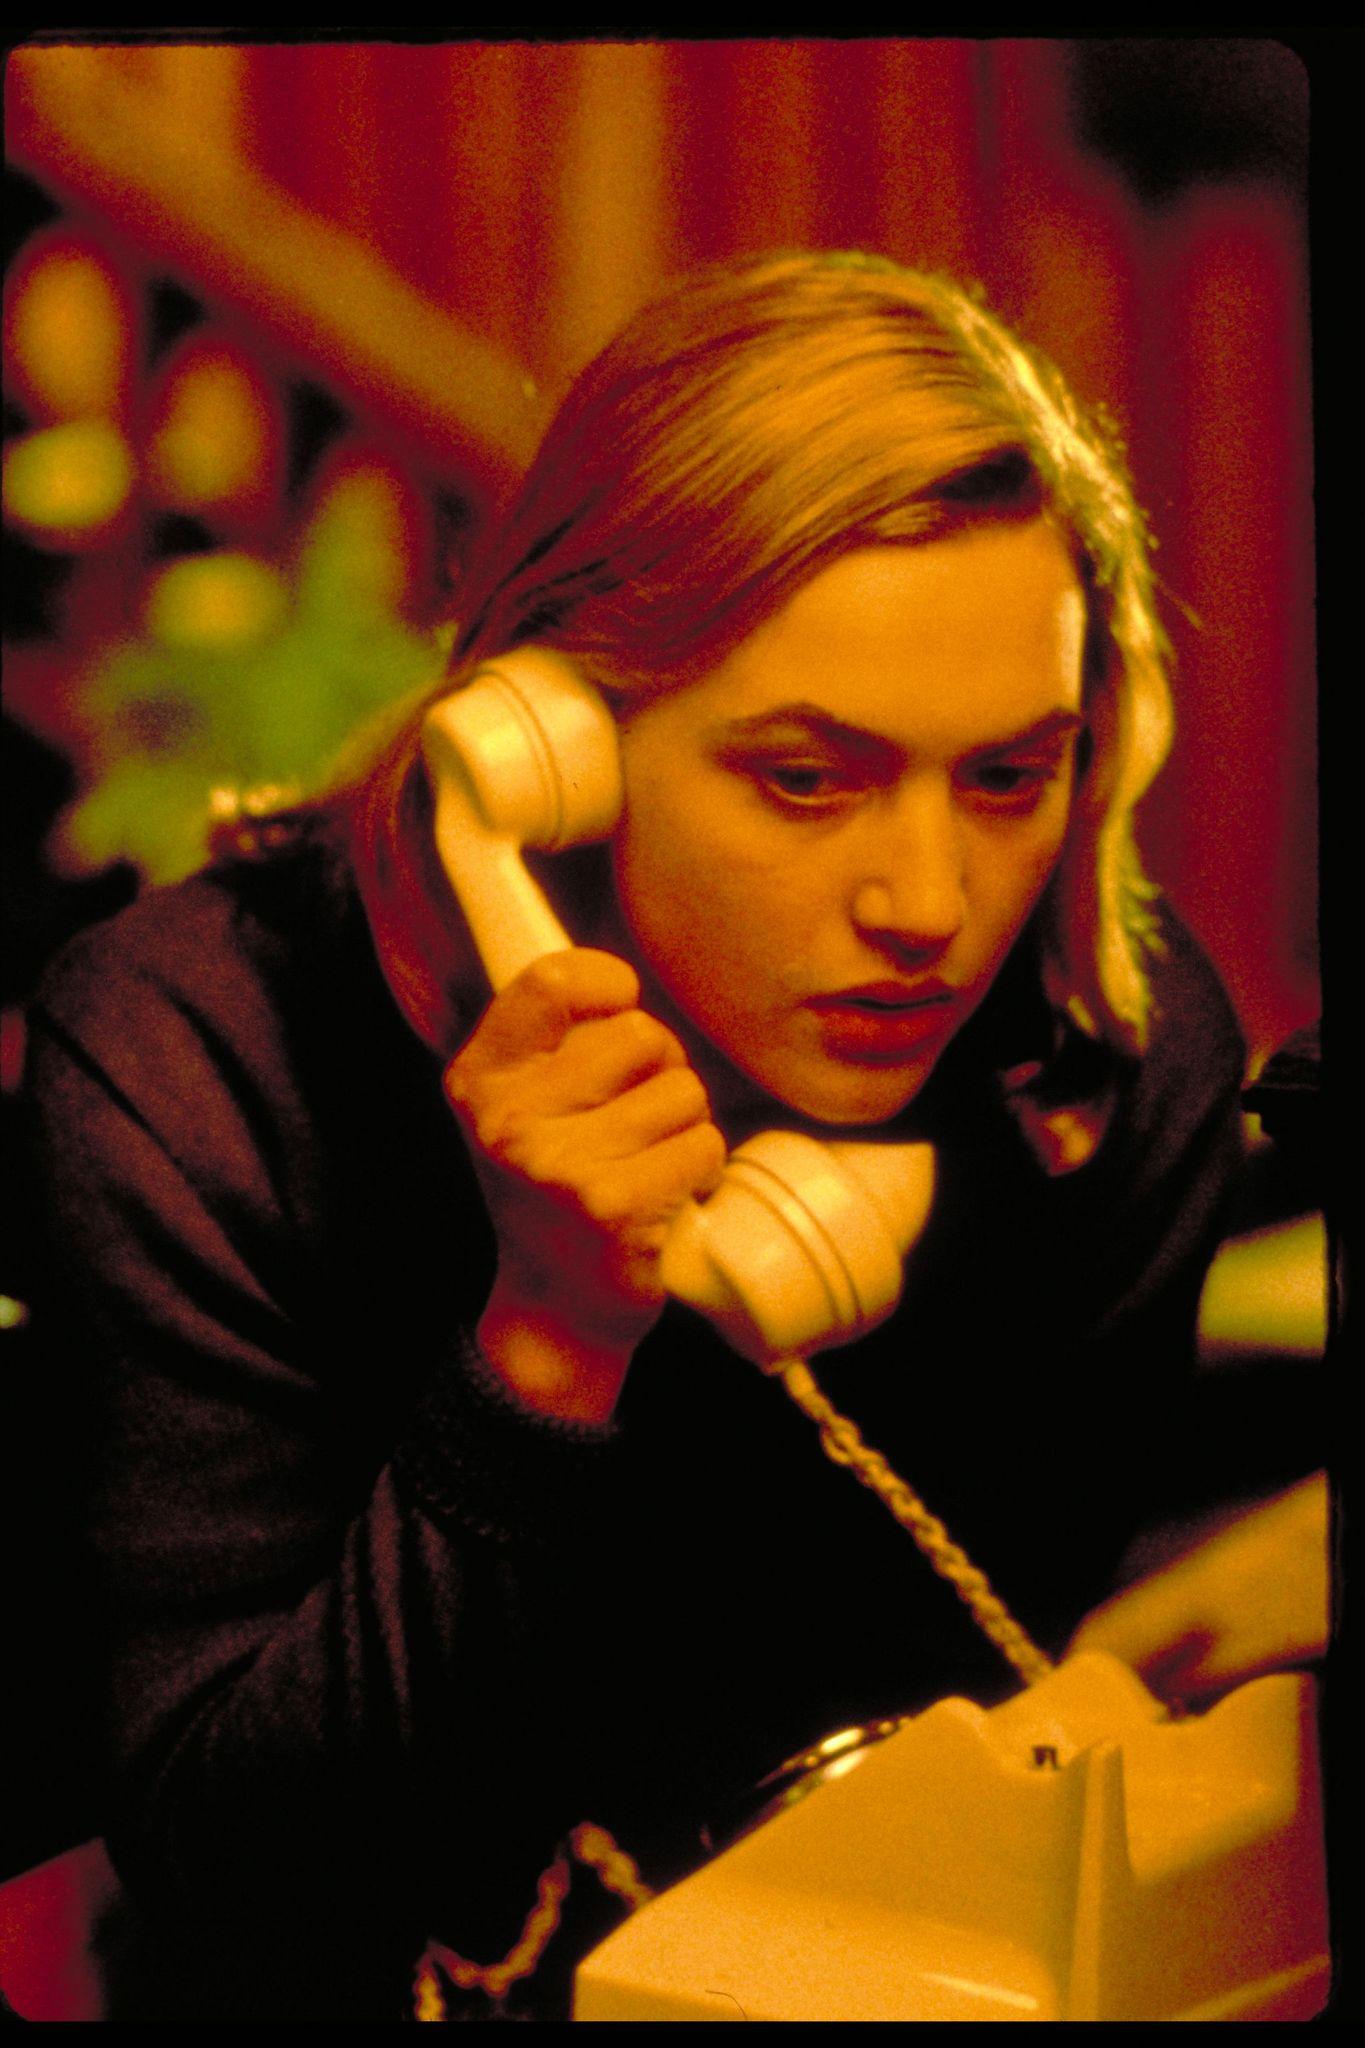 Kate Winslet in Heavenly Creatures (1994)